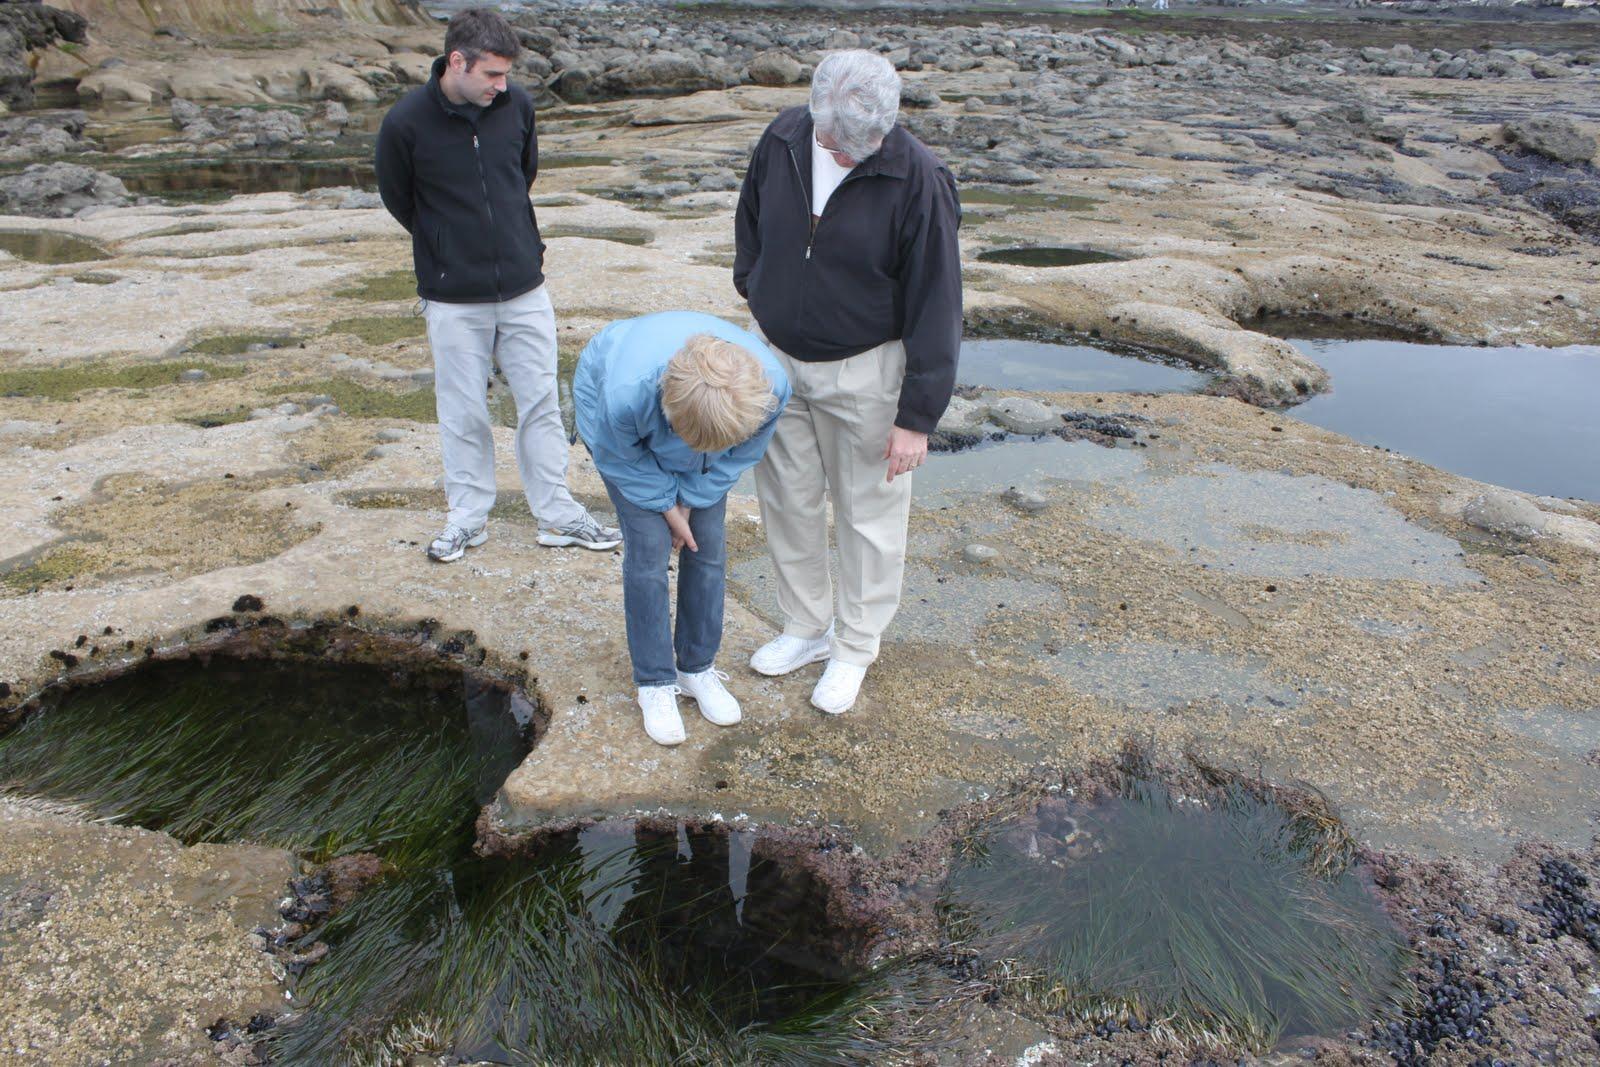 Best kept secrets of victoria at low tide a whole shelf of the rocky coastline is exposed leaving hundreds of large tide pools nvjuhfo Images